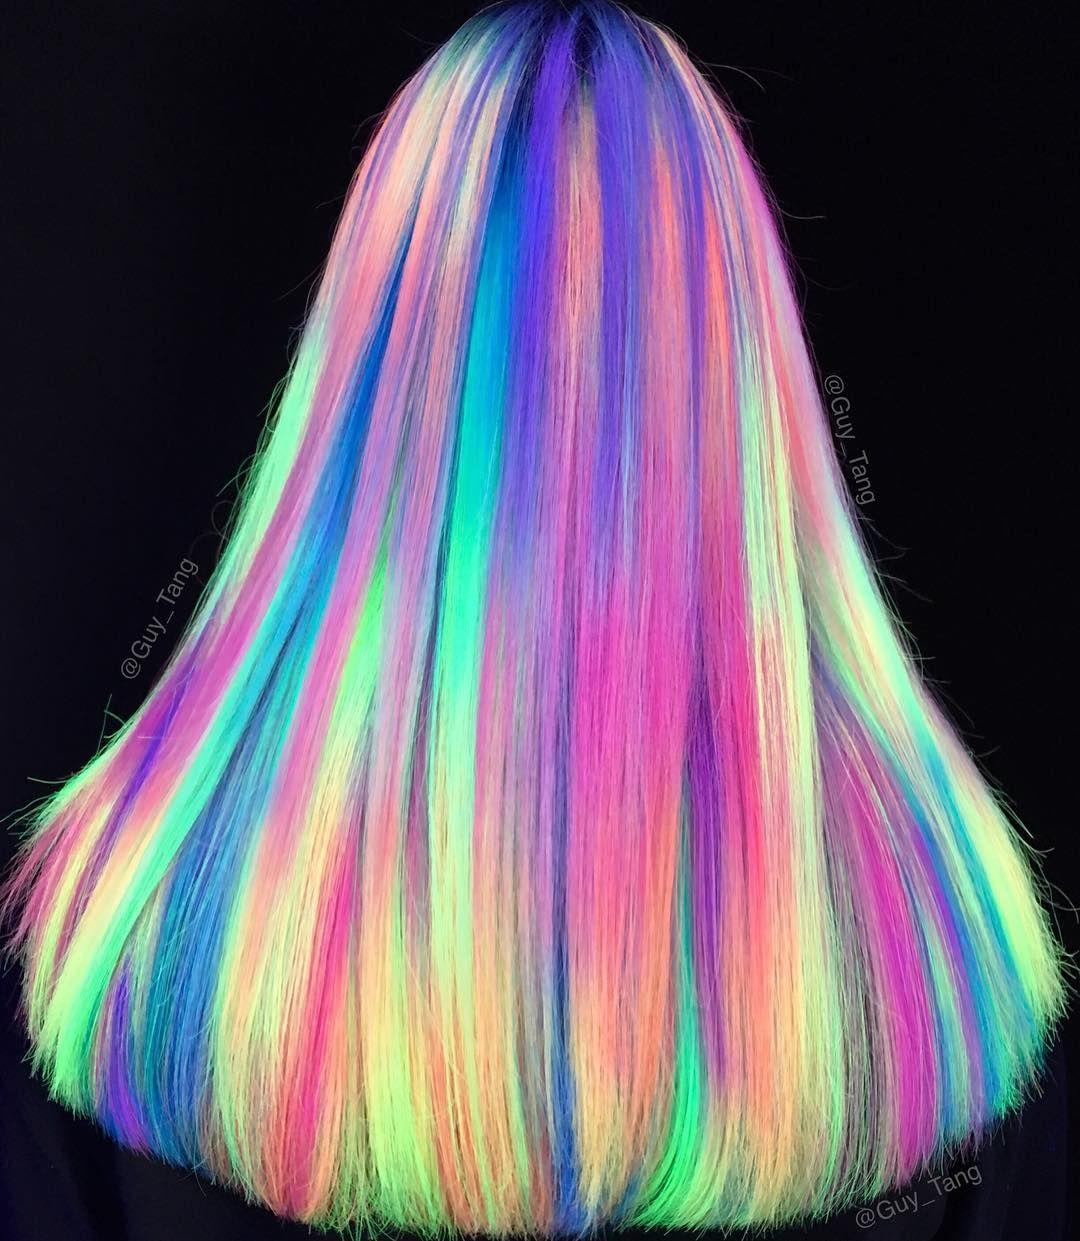 NEON Rainbow Hair by guy_tang Neon hair color, Neon